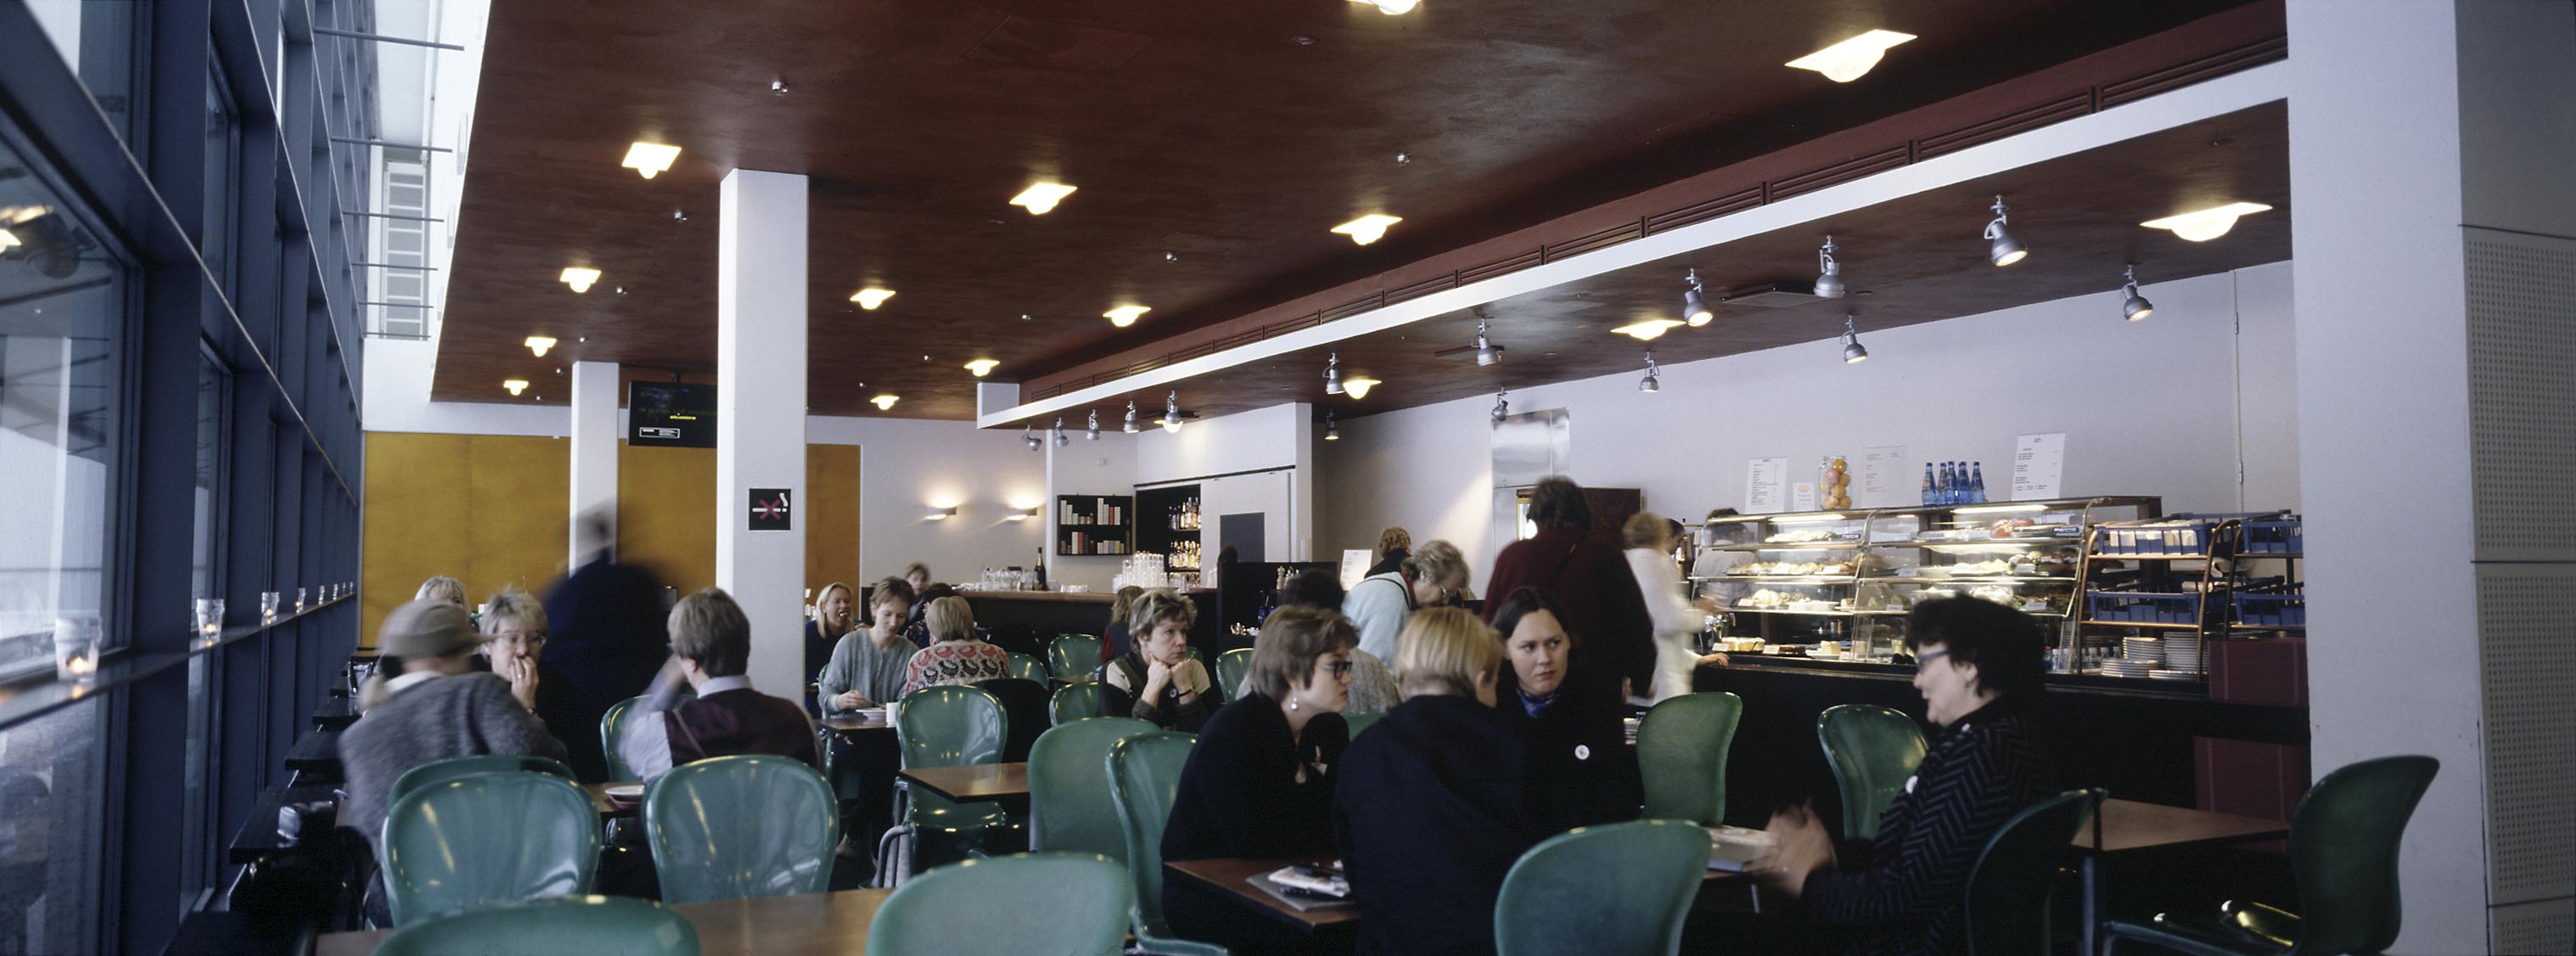 File:Café Kiasma, 1999, 1999.jpg - Wikimedia Commons